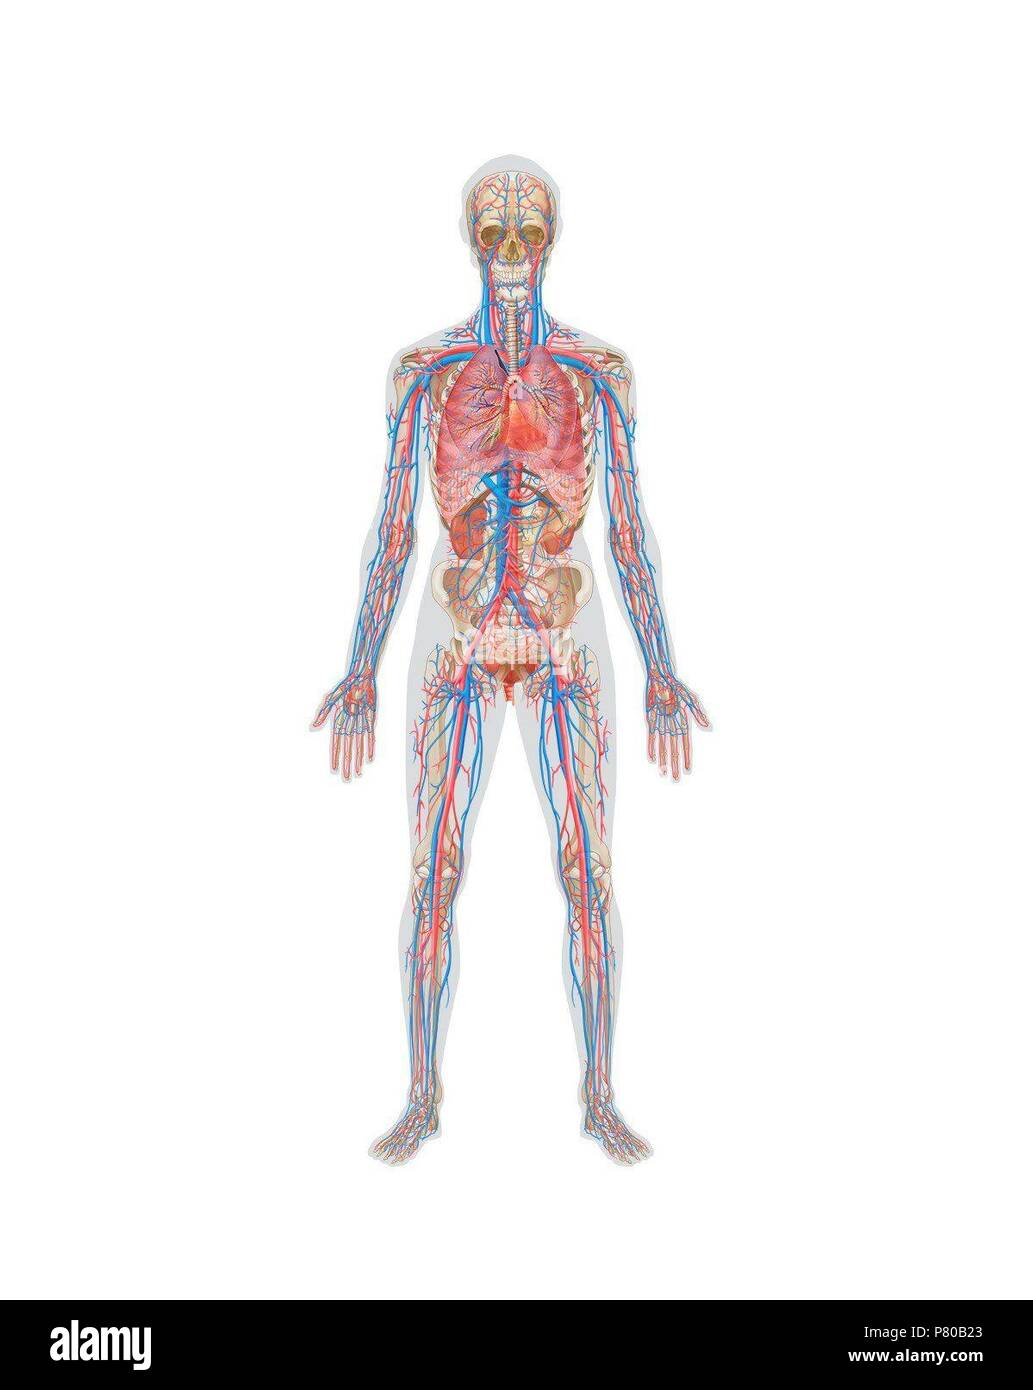 Circulatory Systems Stockfotos & Circulatory Systems Bilder - Alamy